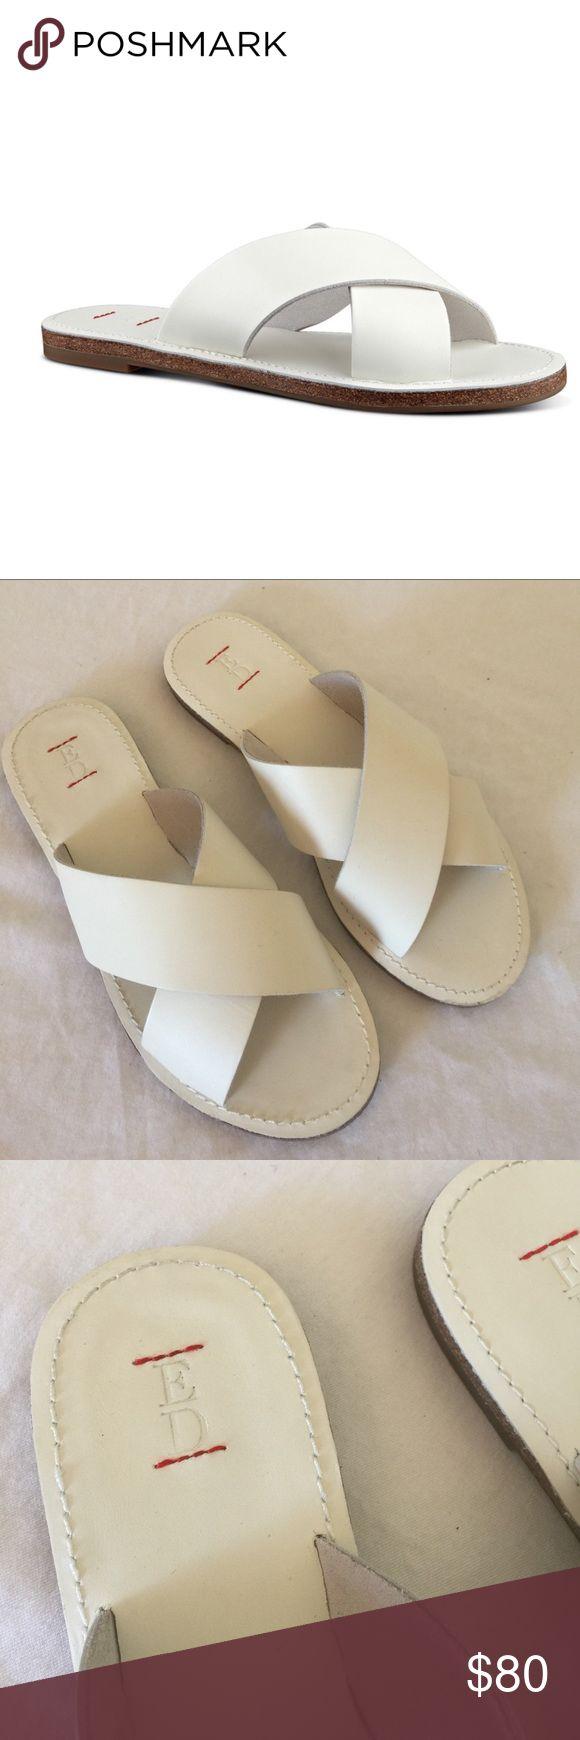 ED ellen degeneress, nwob, 8, sydneys ED for Ellen Degeneress, SYDNEY slides, white, nwob, size 8, soldout online🚫no trades. runs true to size. Looks great with an all white pedicure. ED ellen degeneress Shoes Sandals